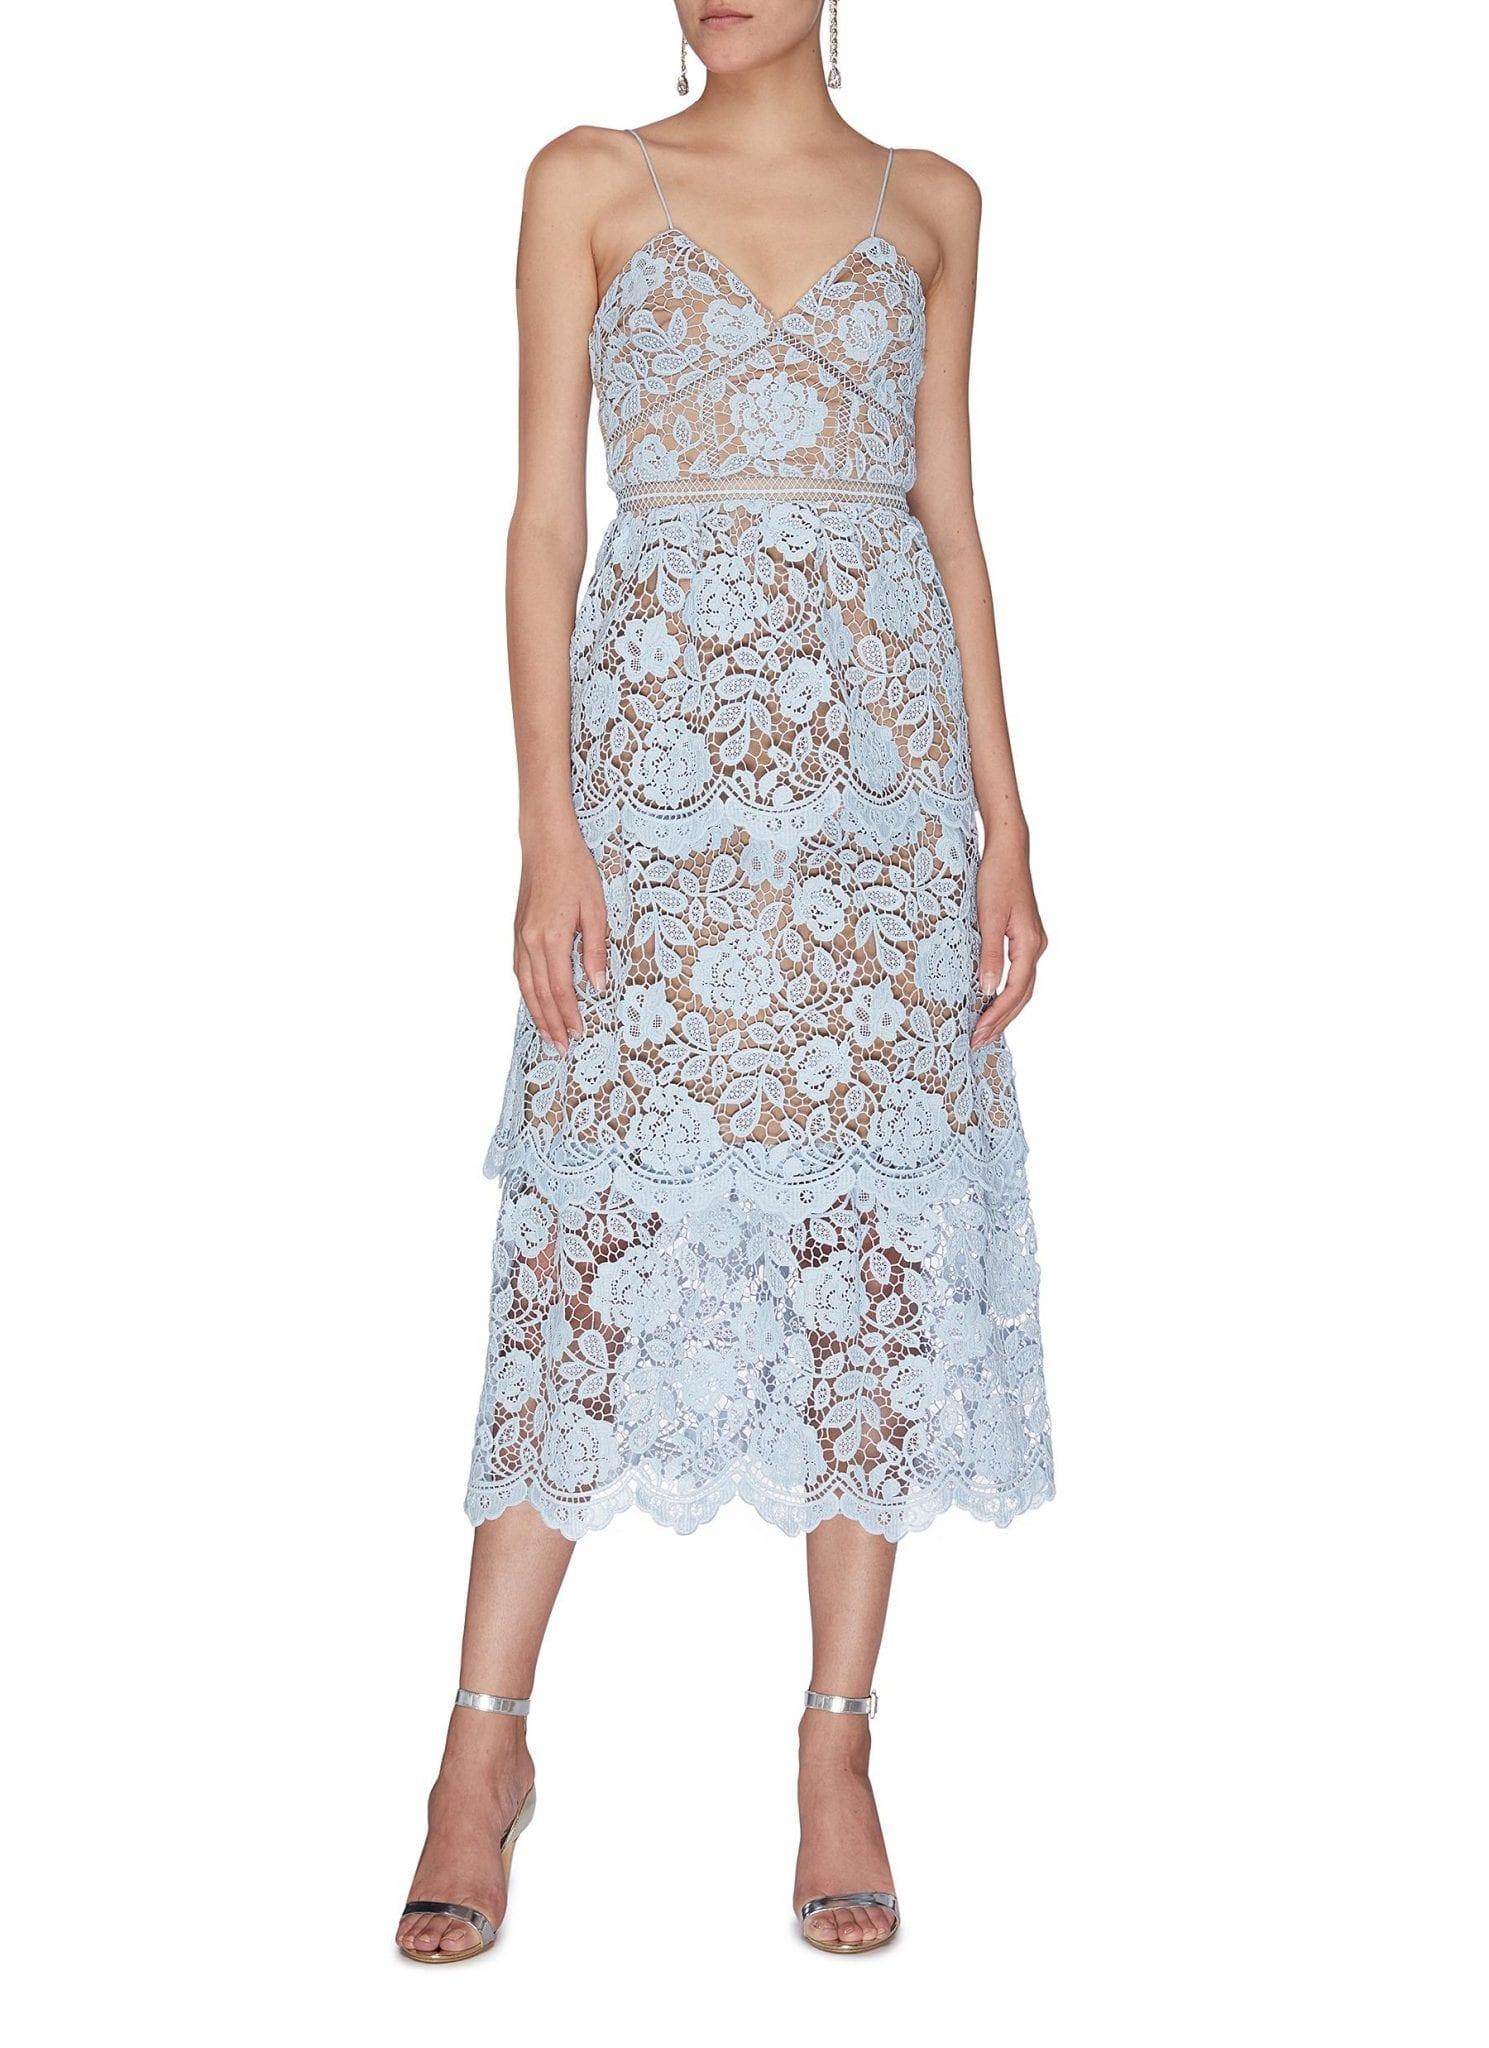 SELF-PORTRAIT Floral Embroidered Guipure Lace Midi Dress